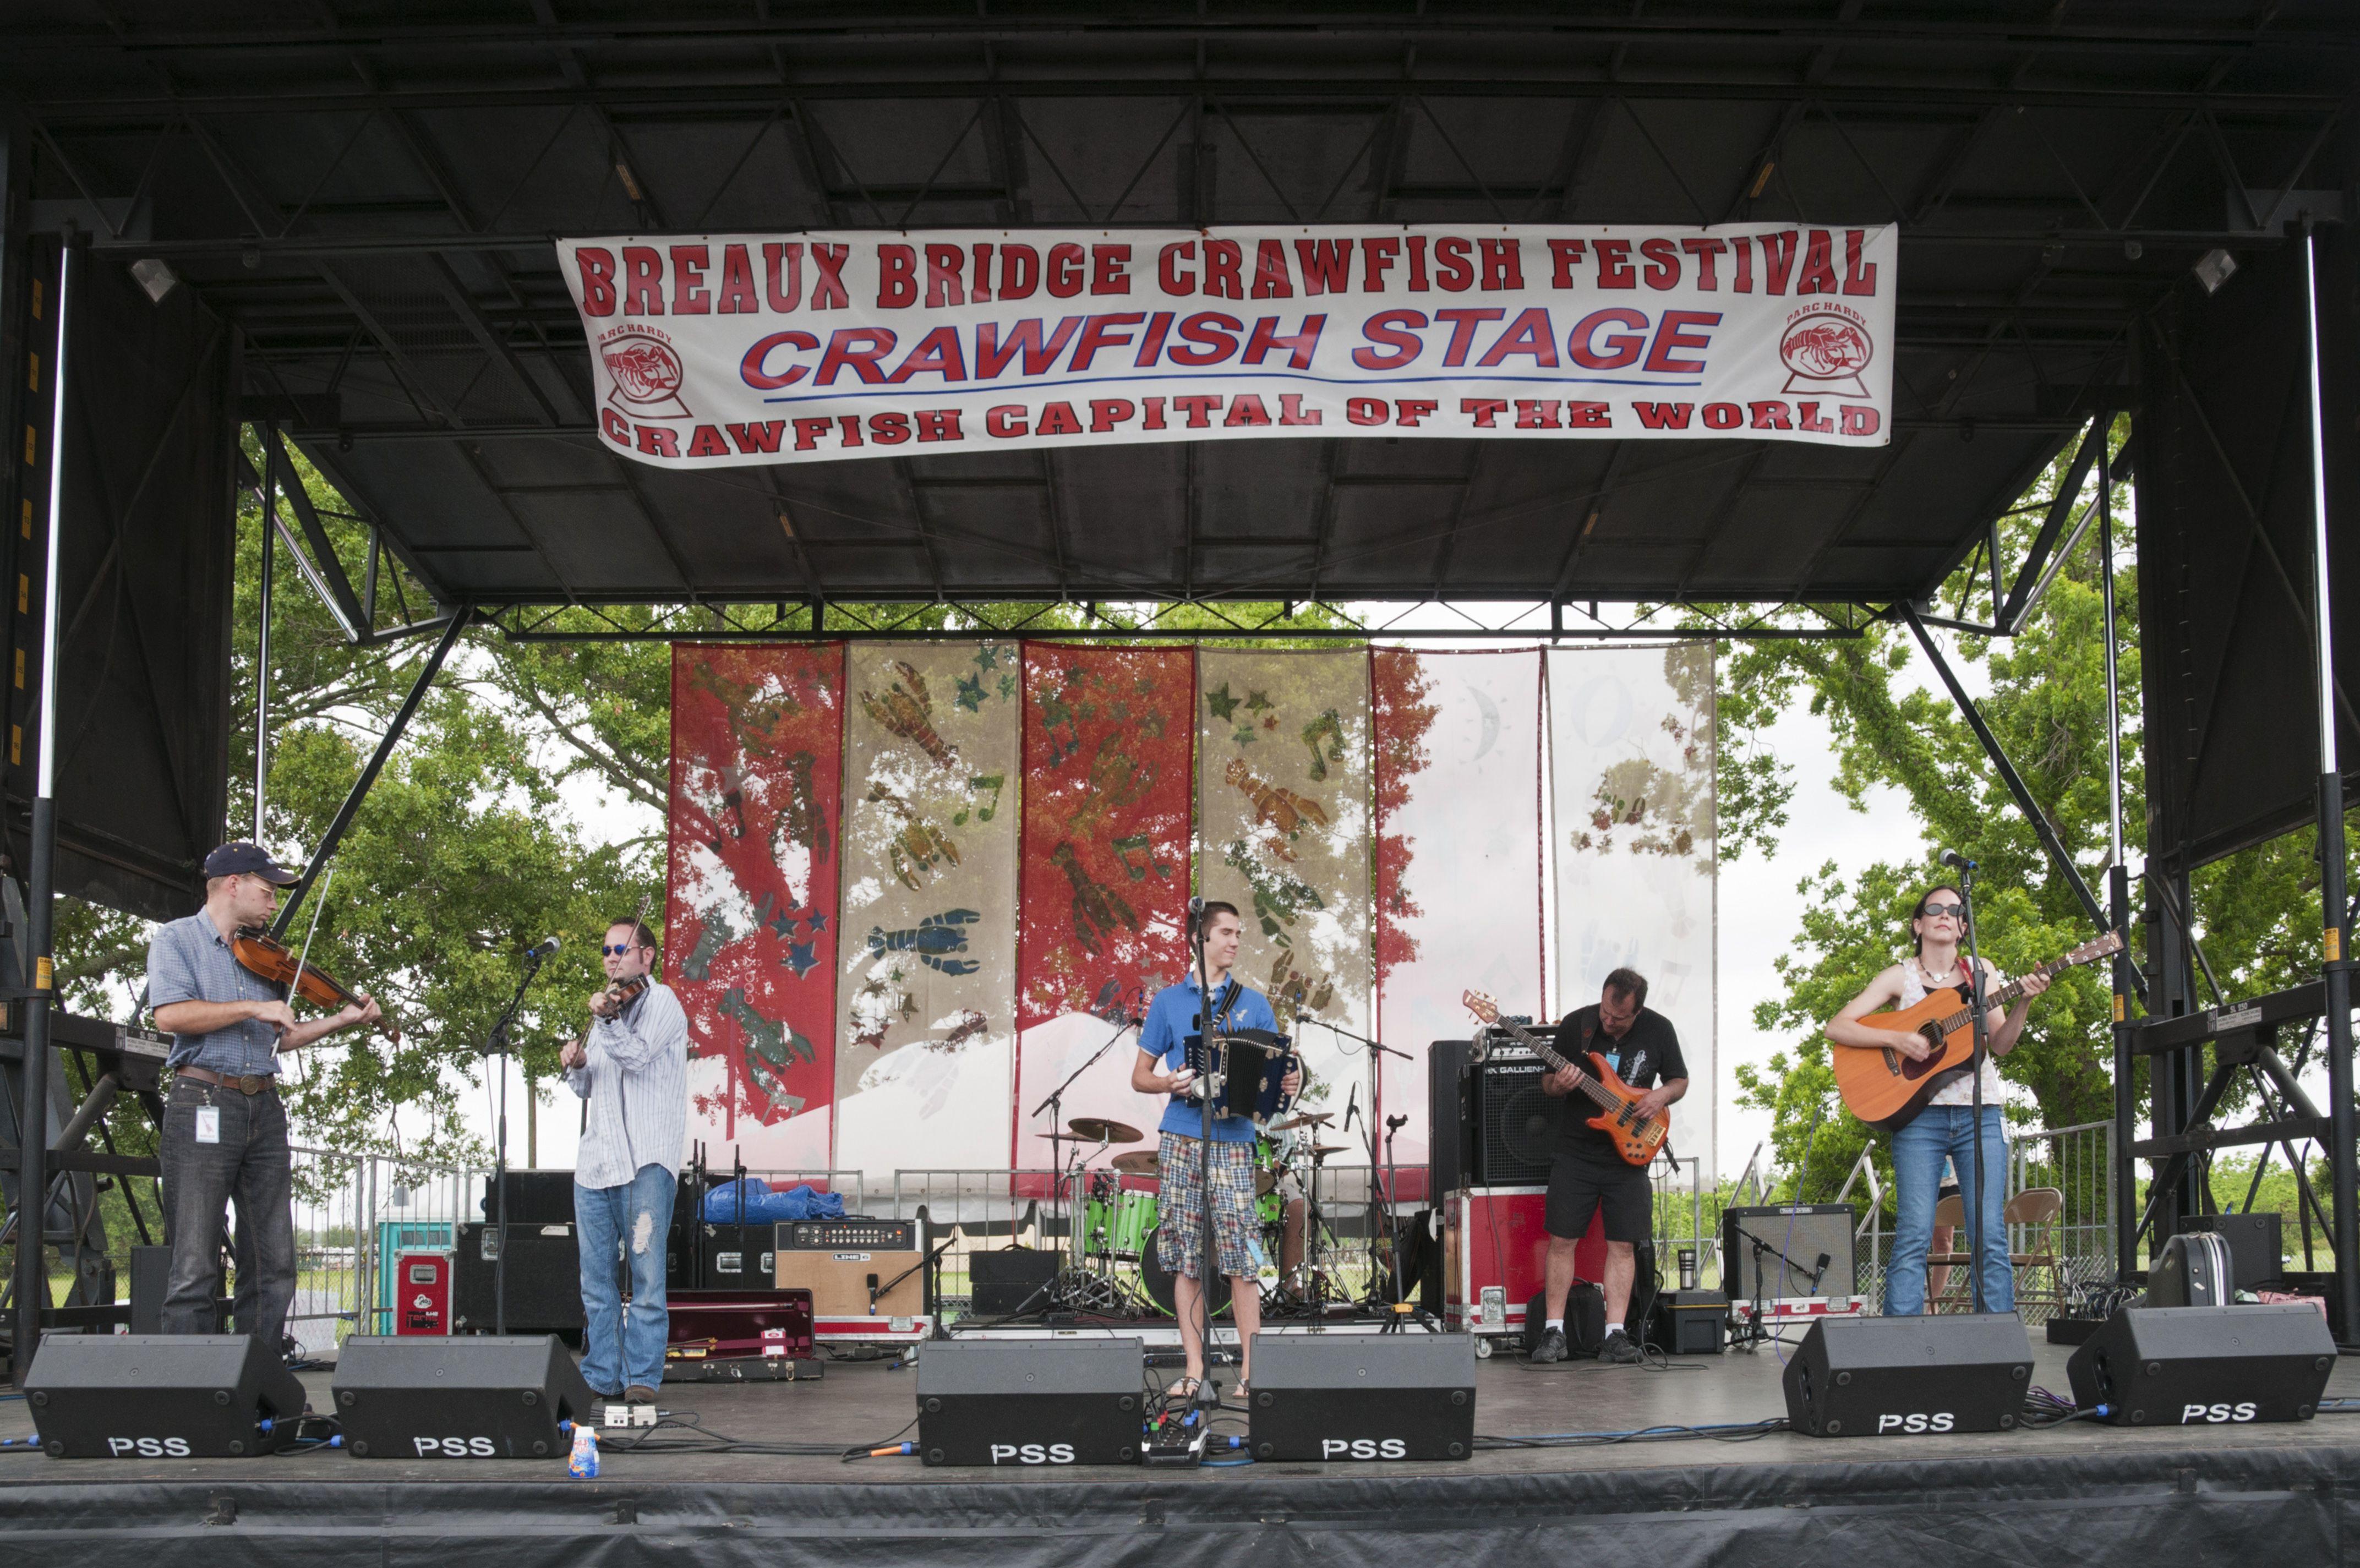 Band playing Cajun music at Annual Crawfish Festival.